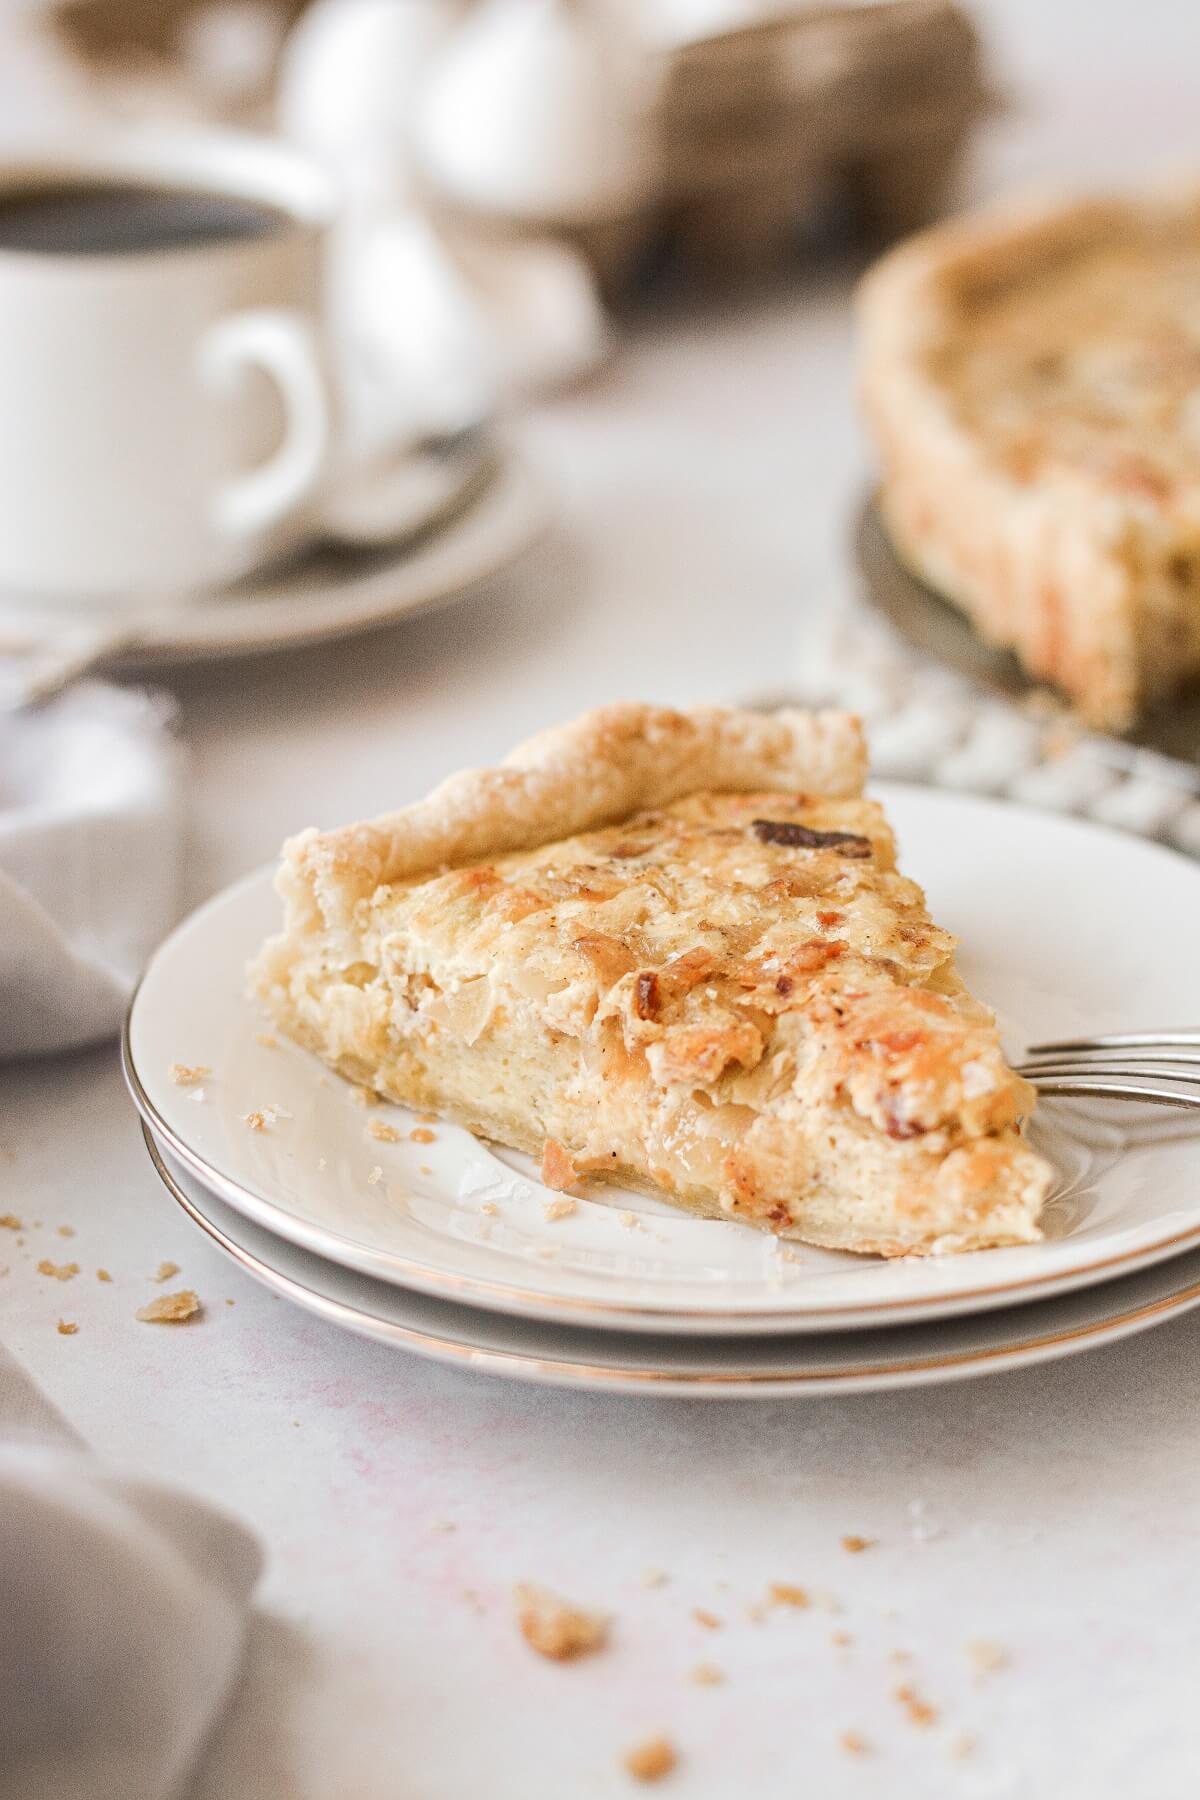 A slice of quiche Lorraine on a white plate.